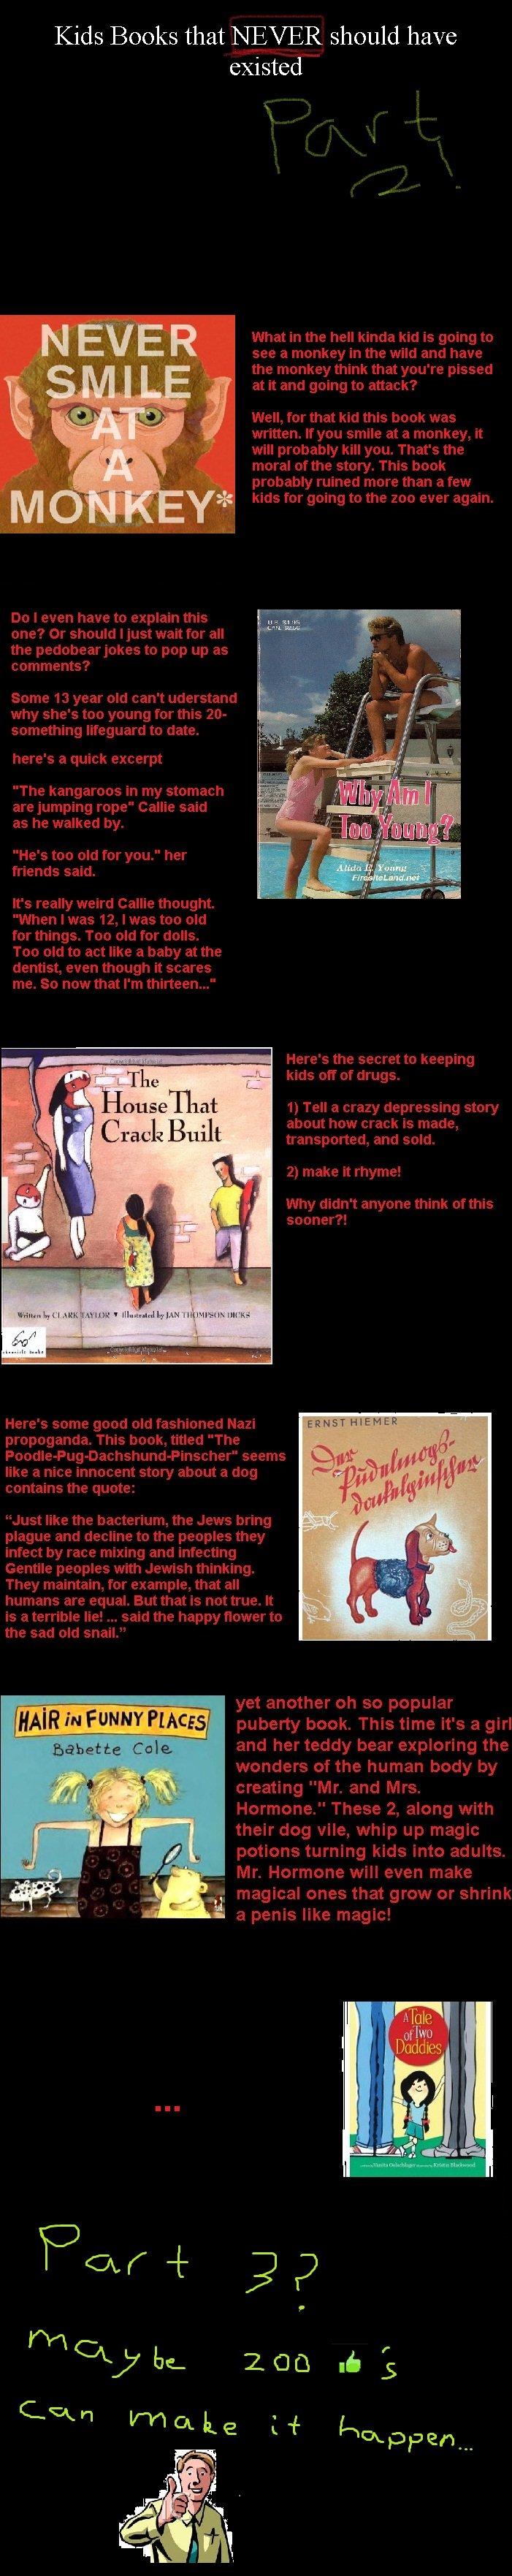 kids book comp part 2. Part 3 is here! funnyjunk.com/funny_pictures/1441320/Kids+book+comp+part+3/<br /> And something else I made funnyjunk.com/funny_pic